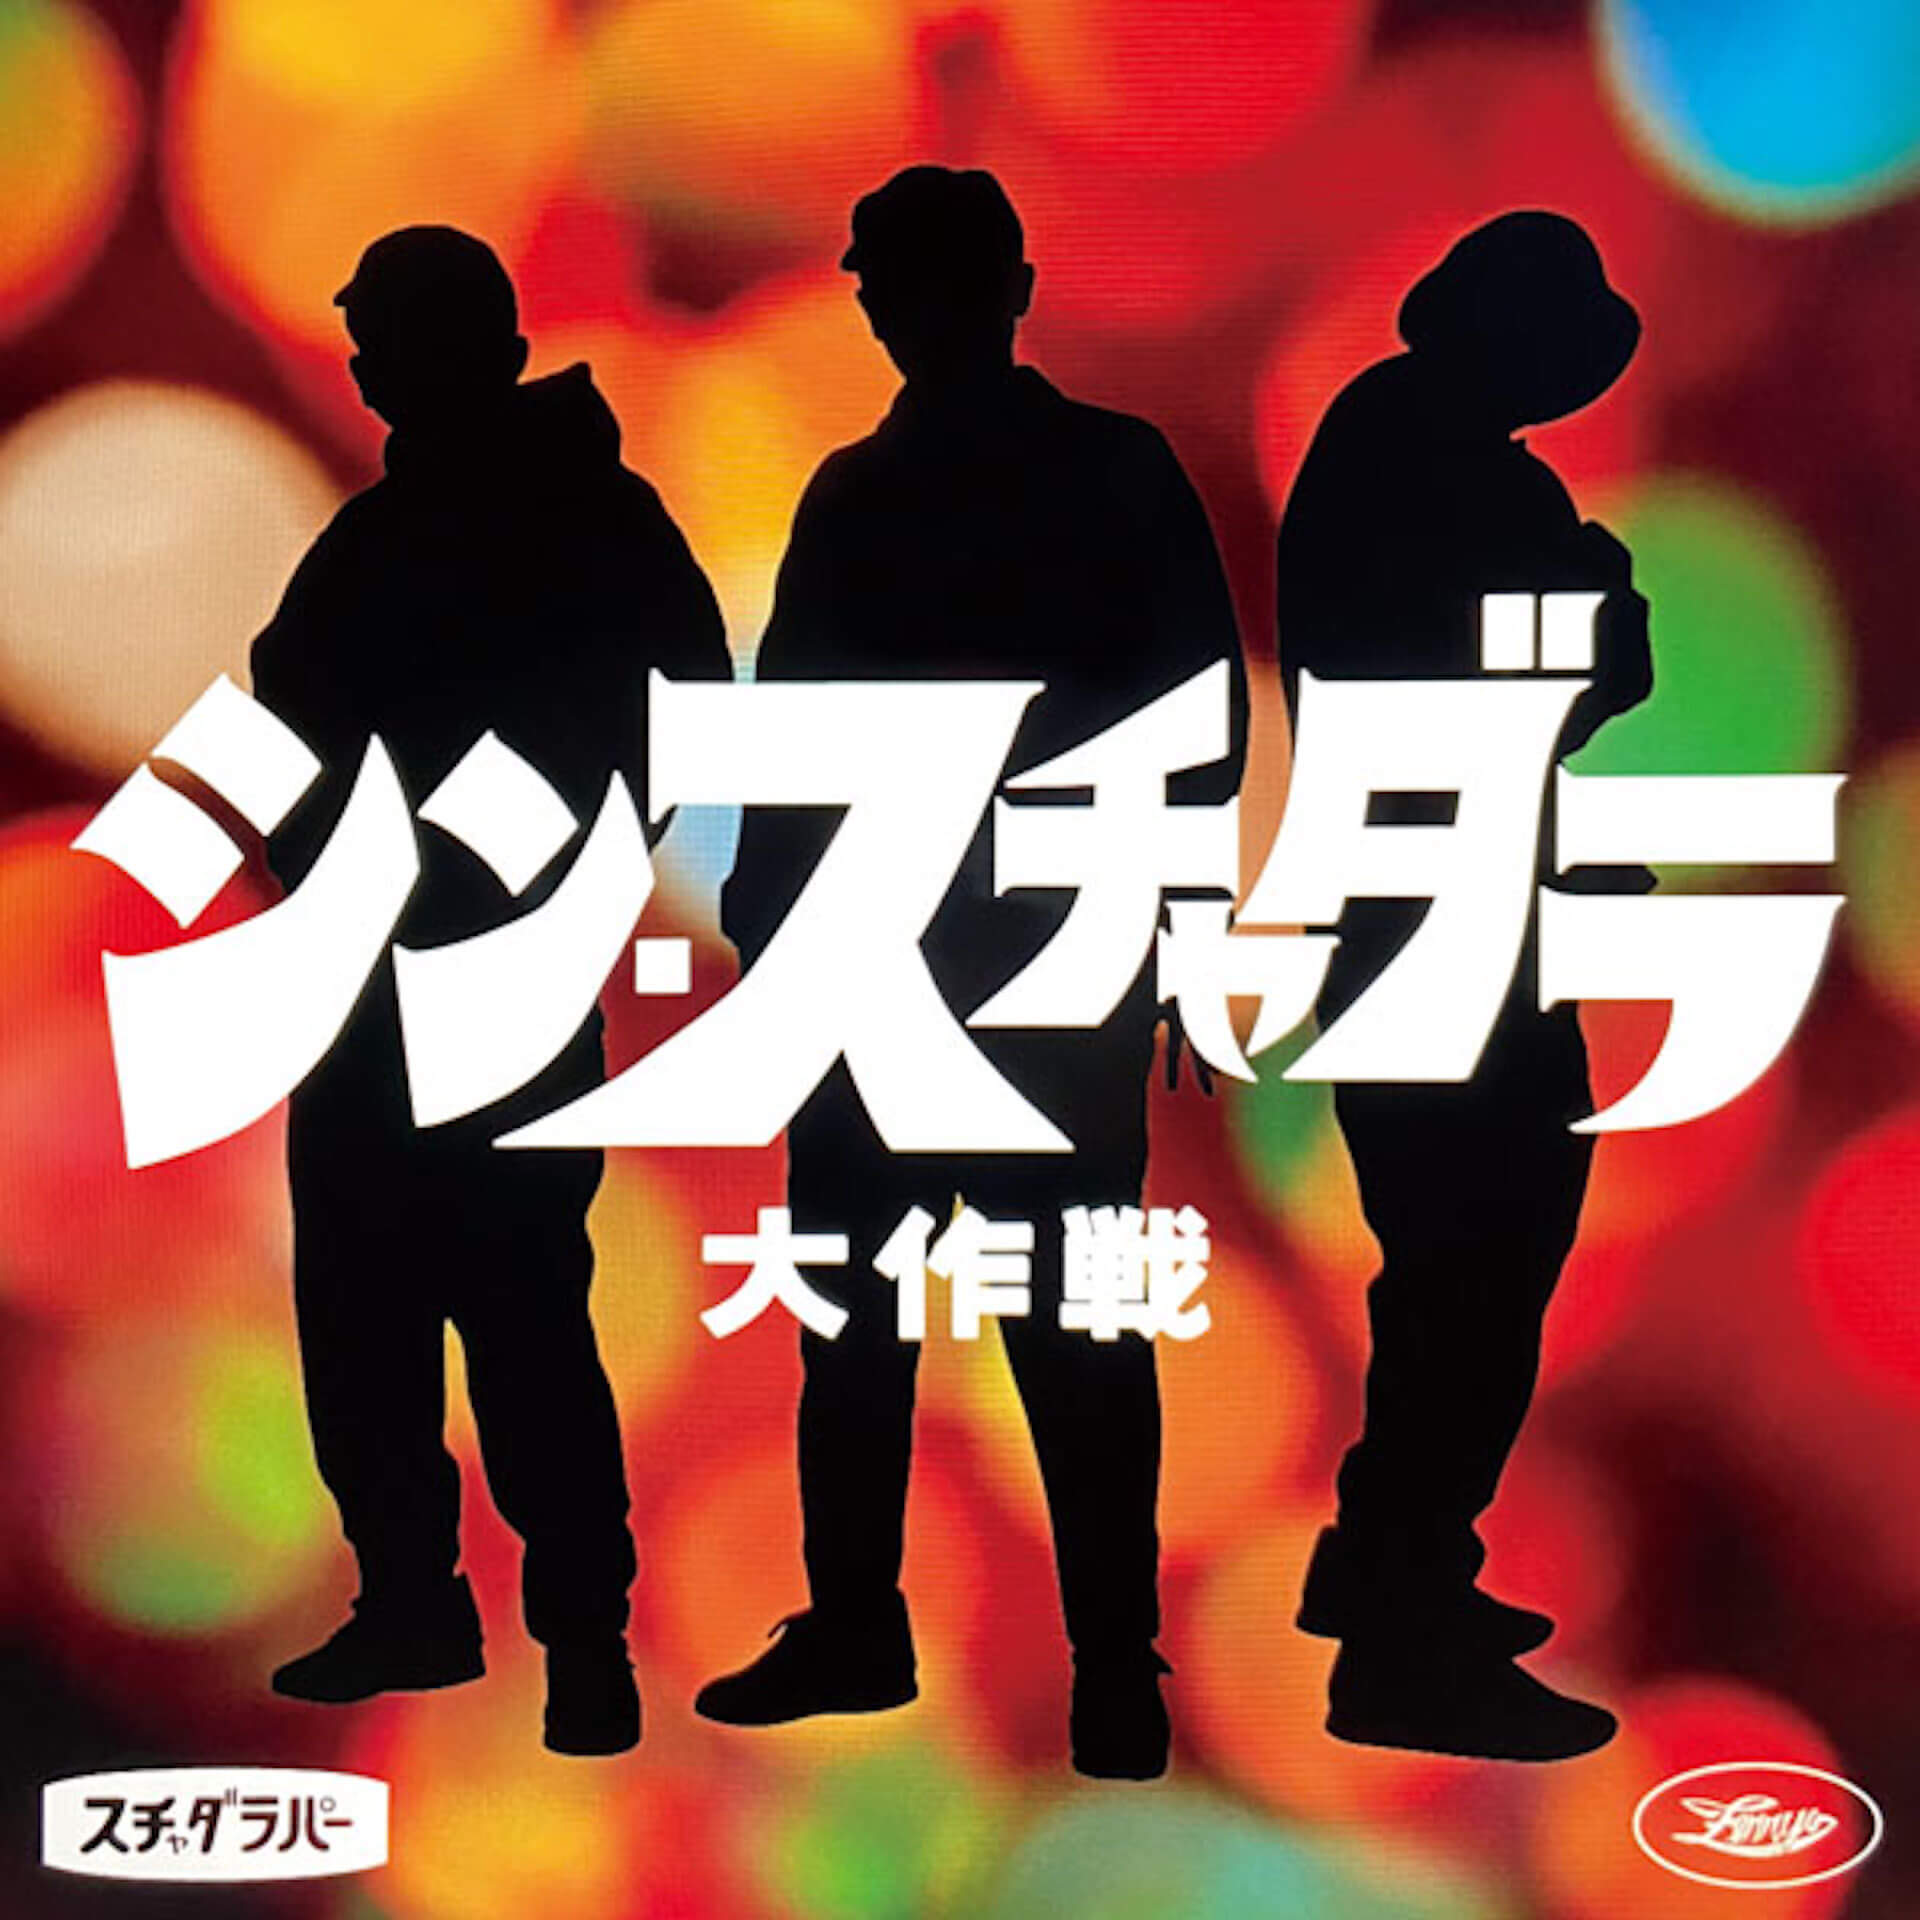 「NO MUSIC,NO LIFE.」ポスターに日本語ラップレジェンドのスチャダラパー×ライムスター、Zeebra×SOUL SCREAMが登場! music200406_nomusicnolife_04